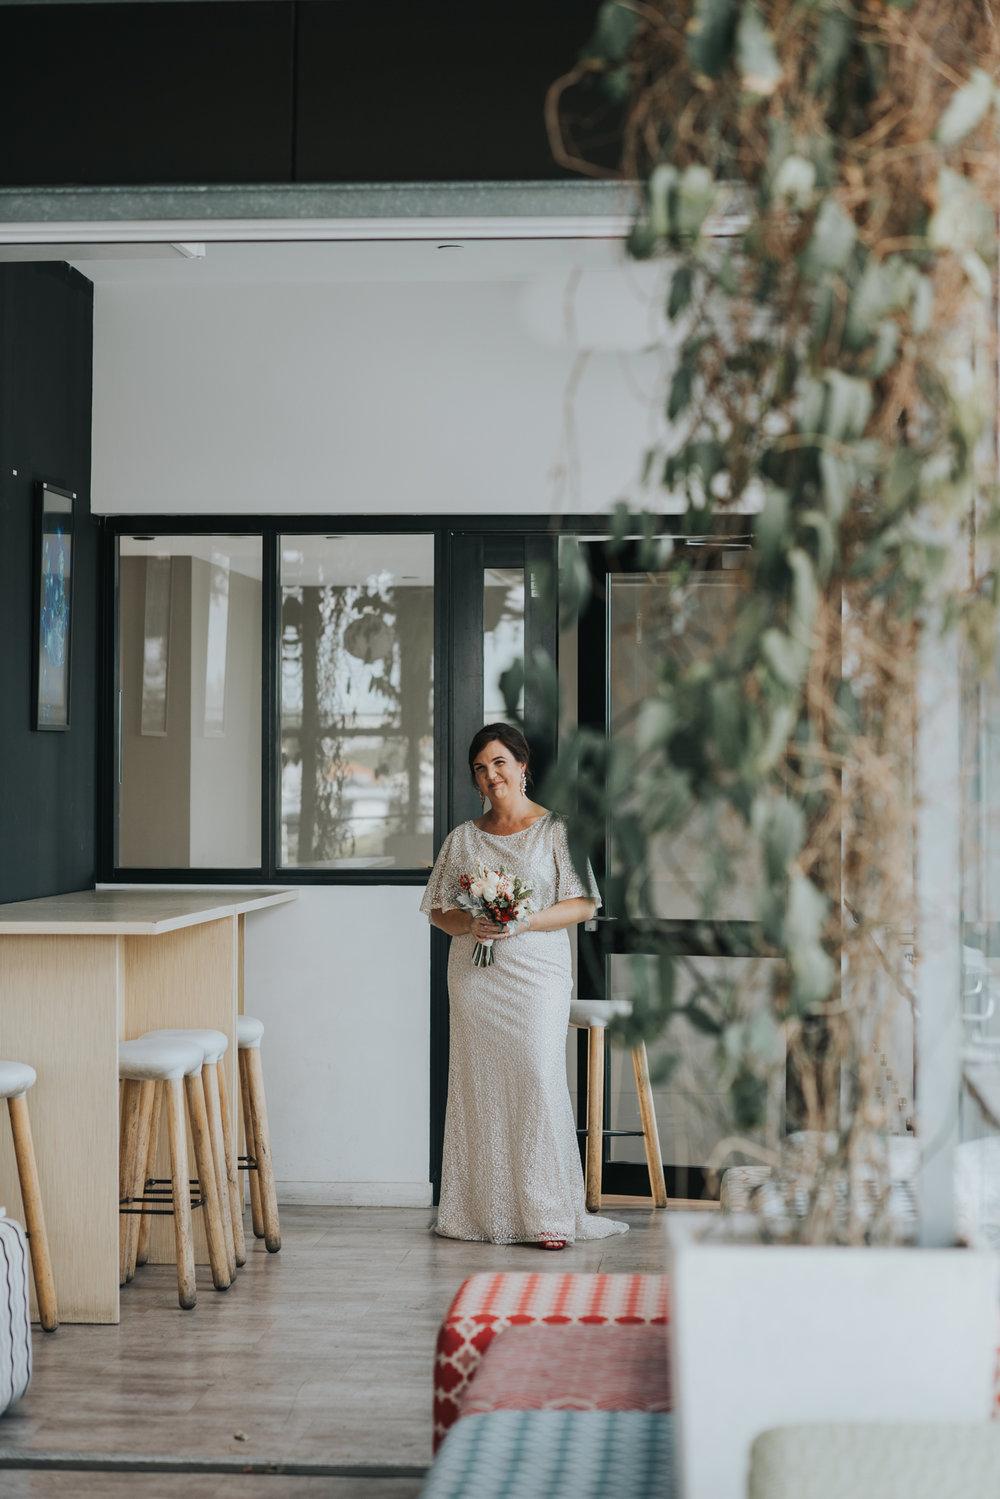 Brisbane Engagement Photographer | Wedding-Elopement Photography-21.jpg